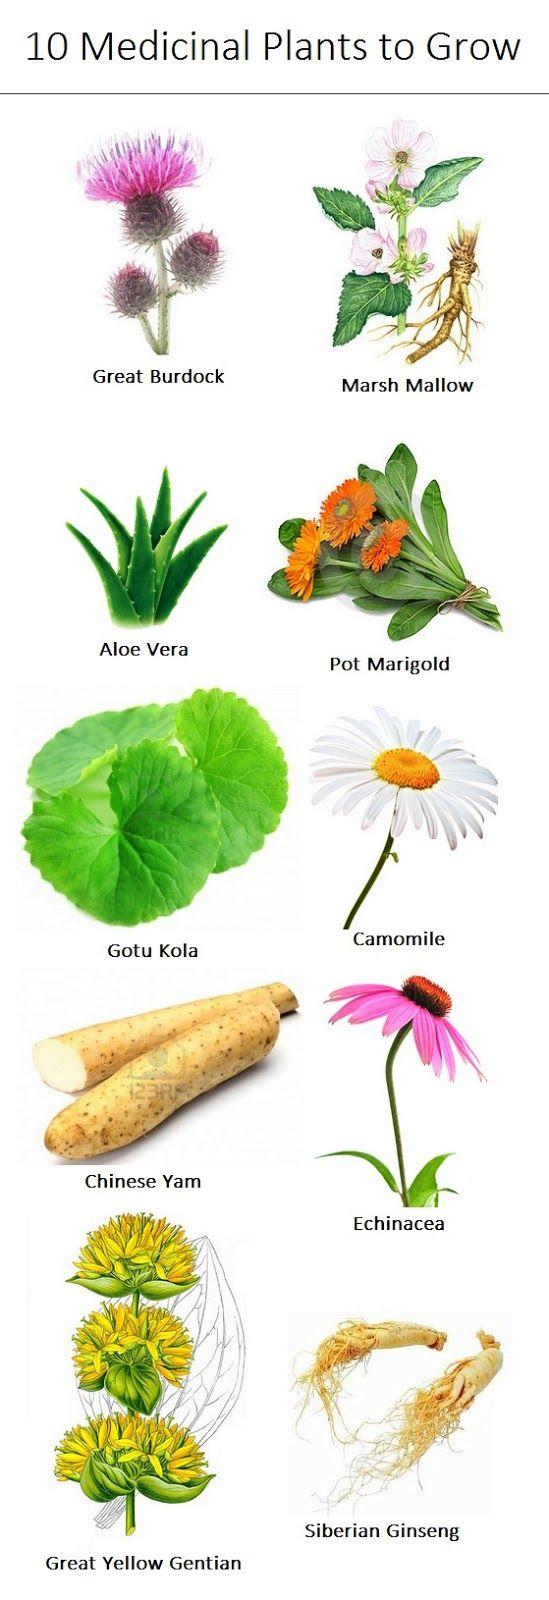 10 Medicinal Plants to Grow | Survival Prepping Tips at Survival Life Blog: survivallife.com #survival #prepping #survival-gear